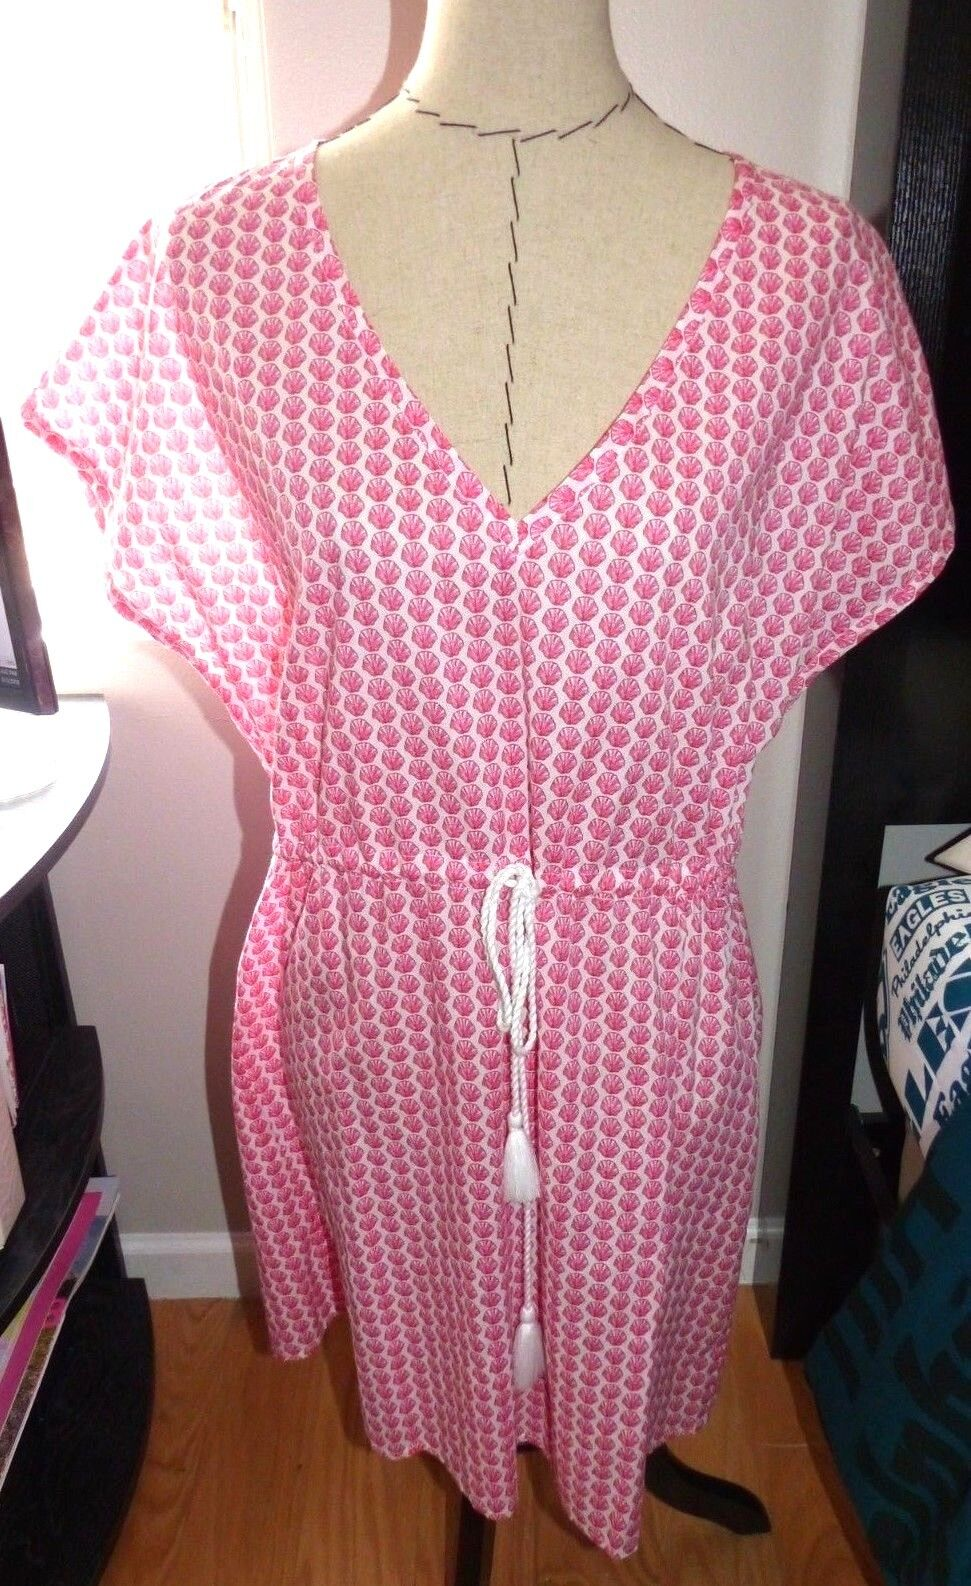 VINEYARD VINES Women's Shell Print Coverup Dress Cotton  Sz LG NWT  128